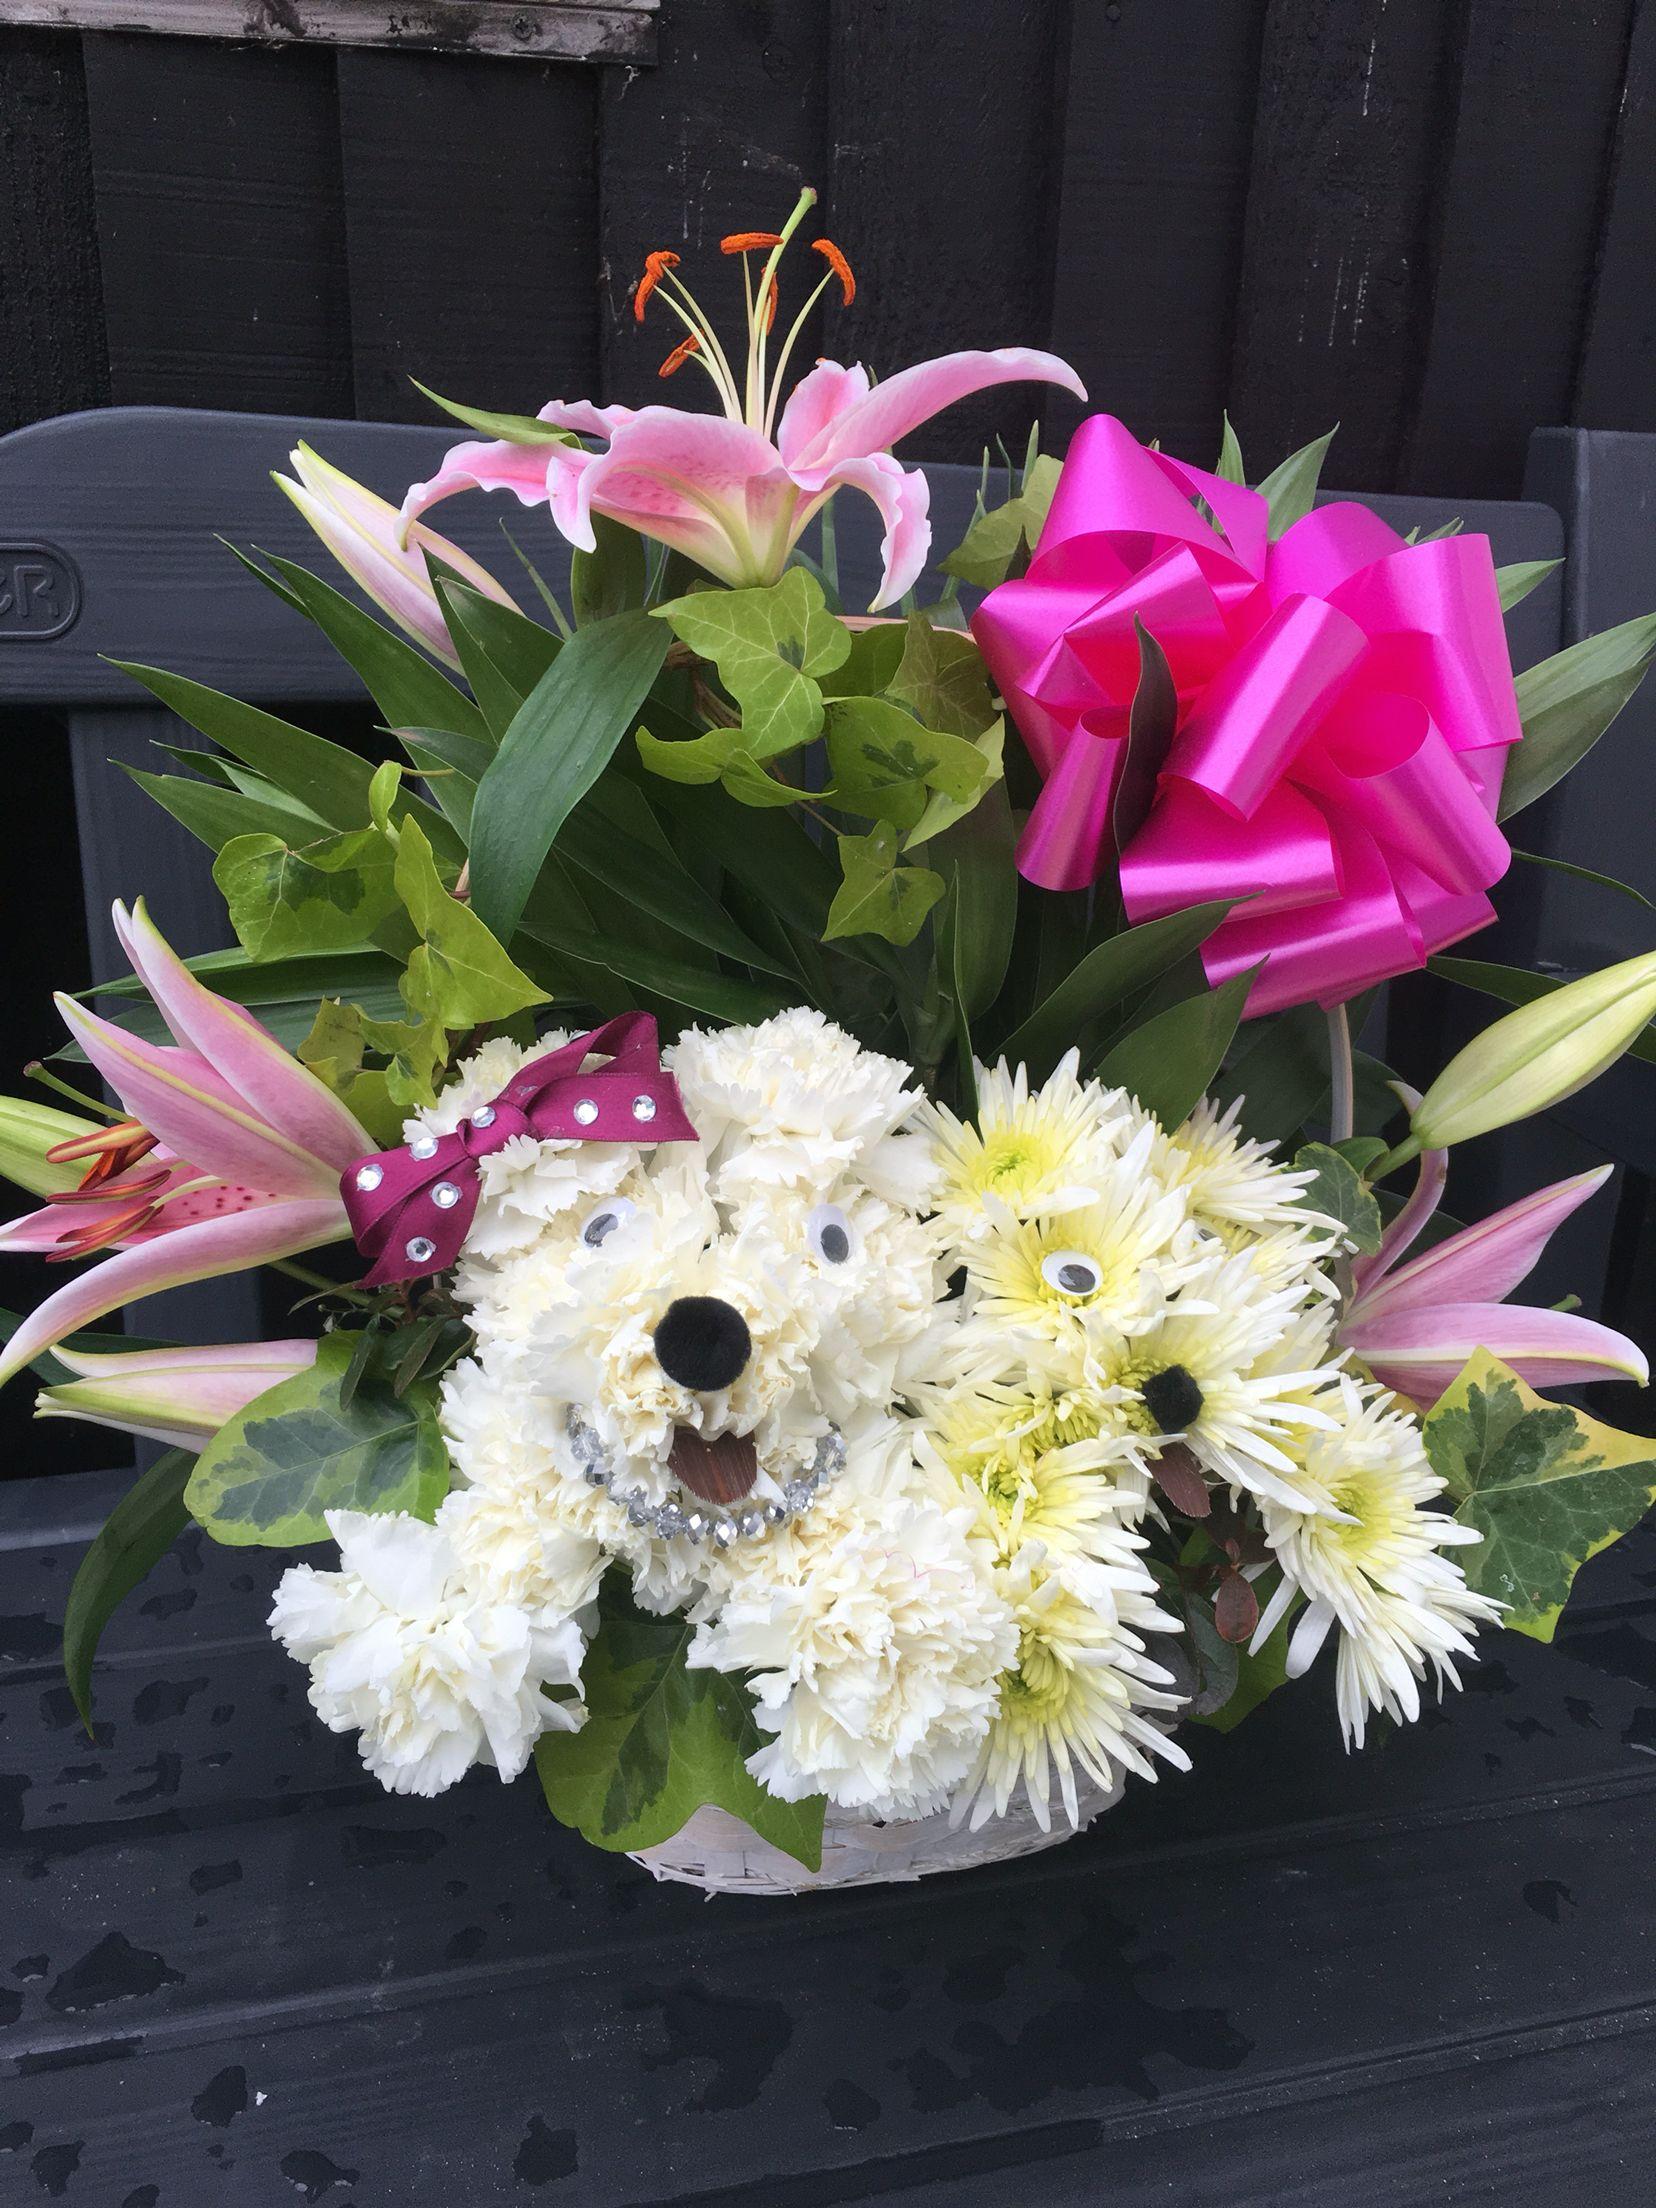 Puppy Flower Basket Birthday Flower Gift For My Nieces 18th Cute